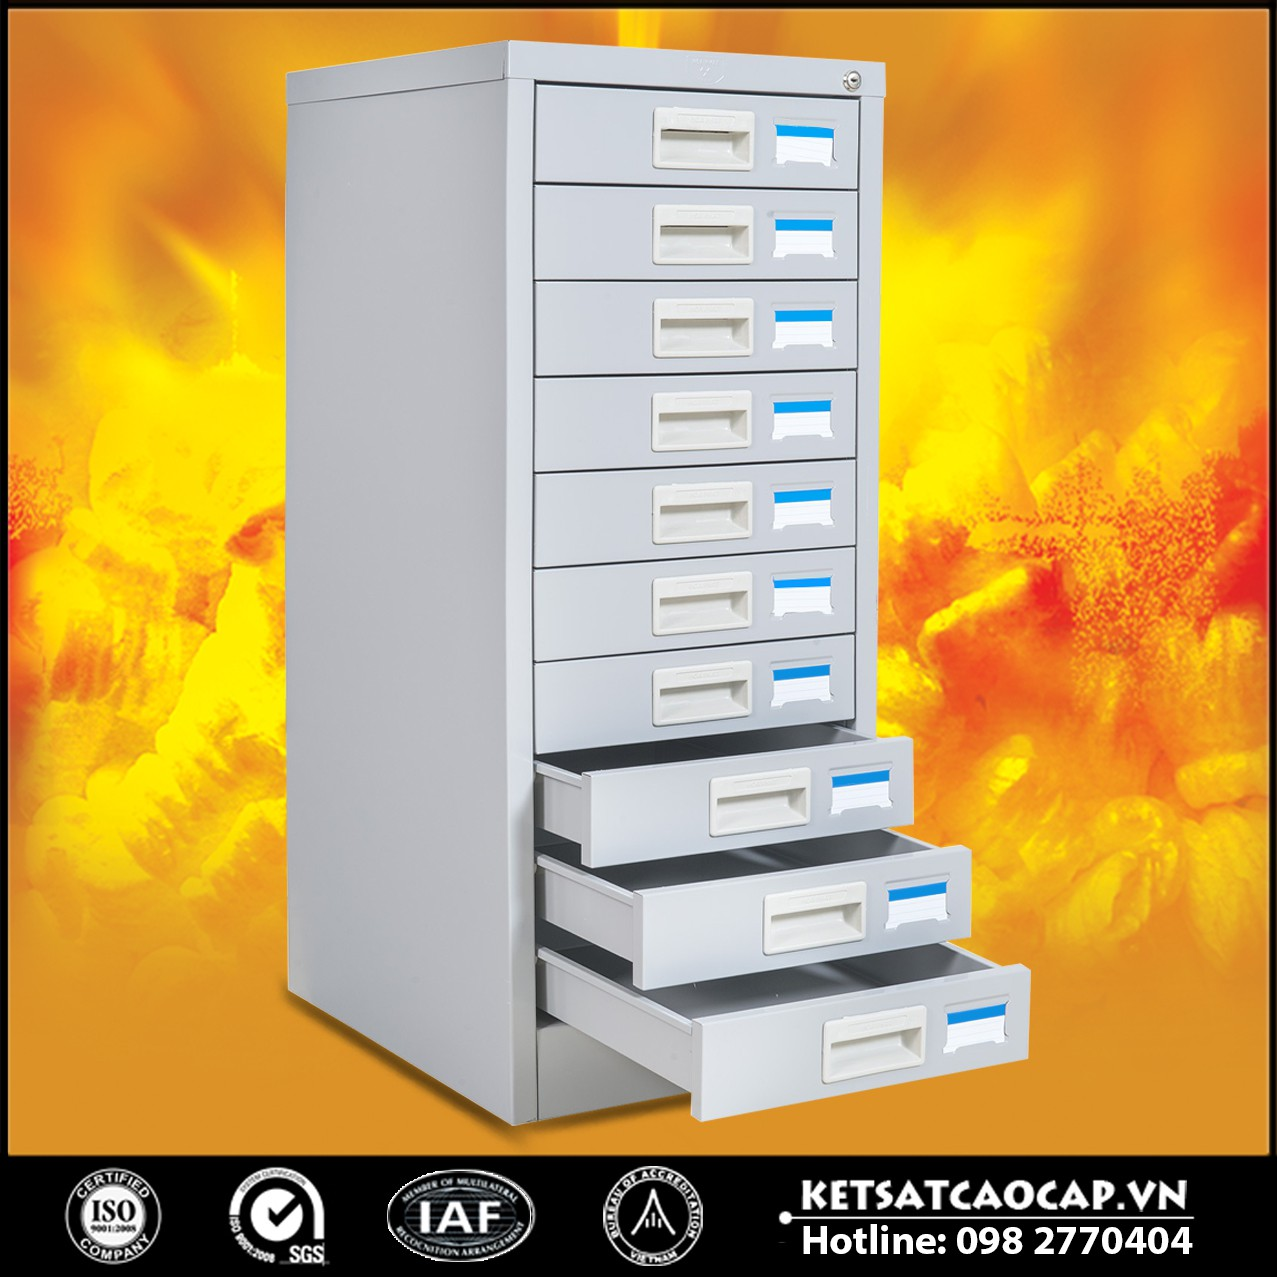 Cửa Hàng Tủ Sắt Để FILE Tài Liệu BEMC - 10F